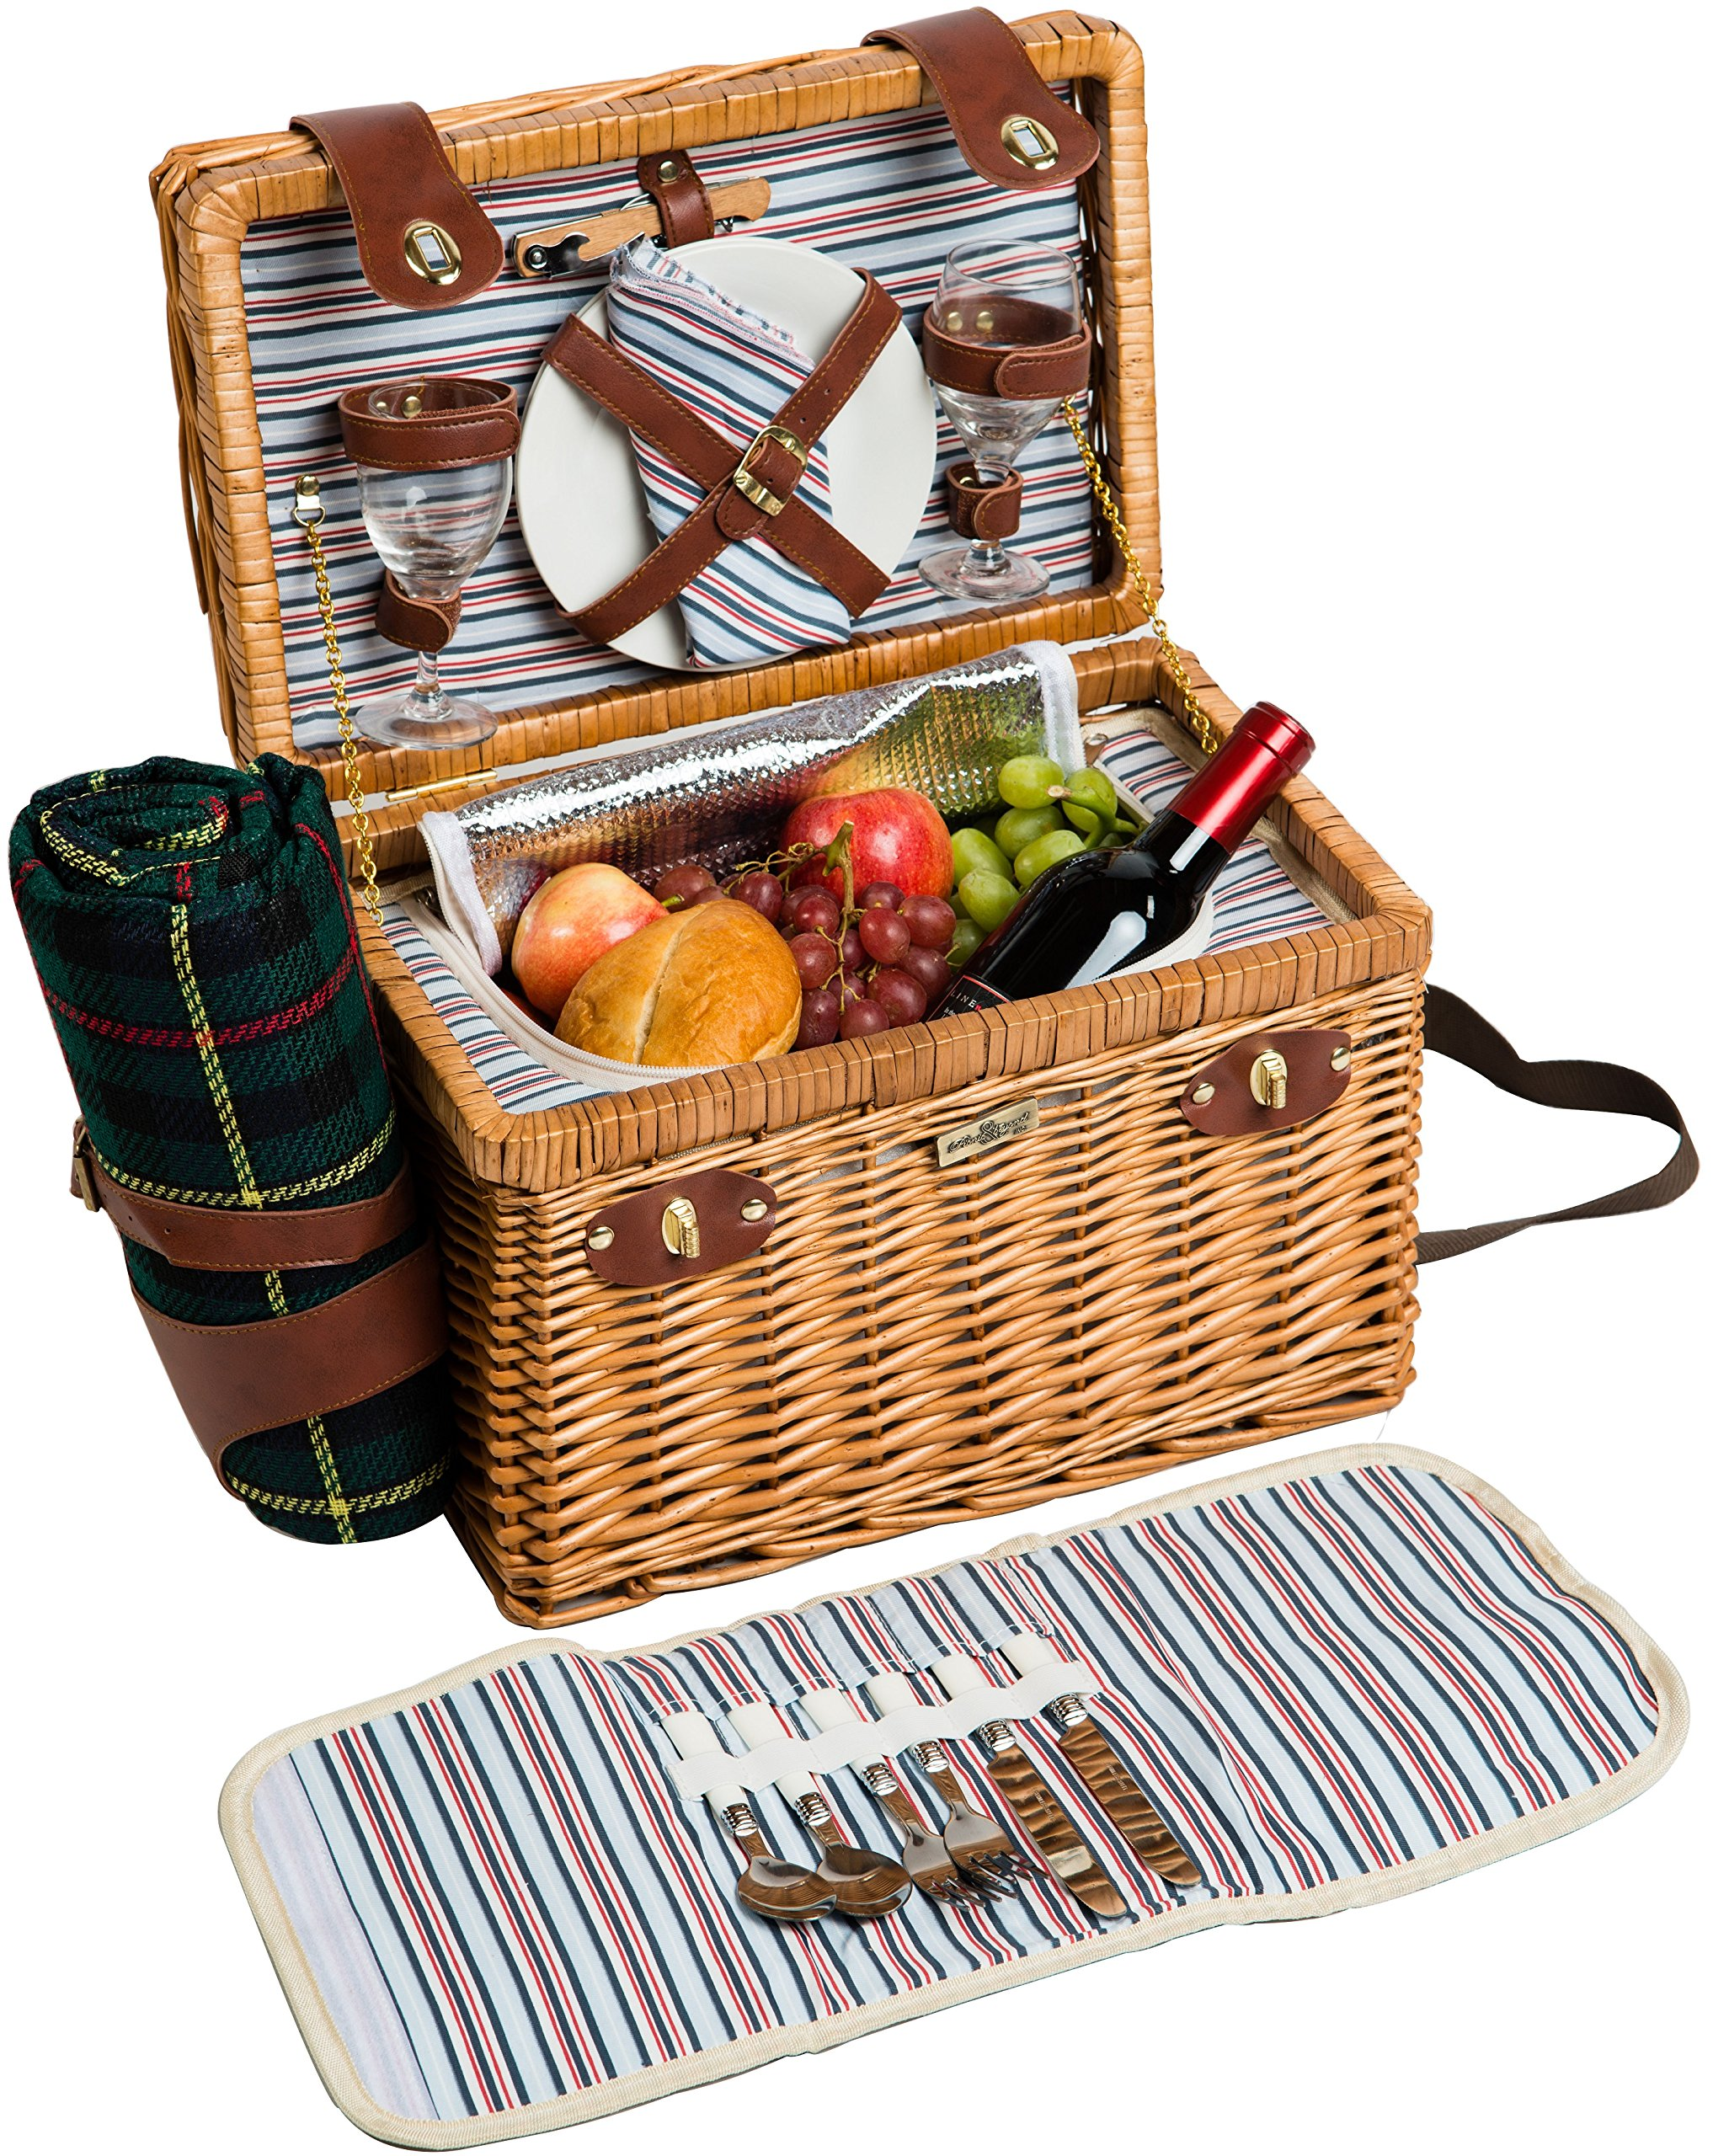 Willow & Wood Picnic Basket